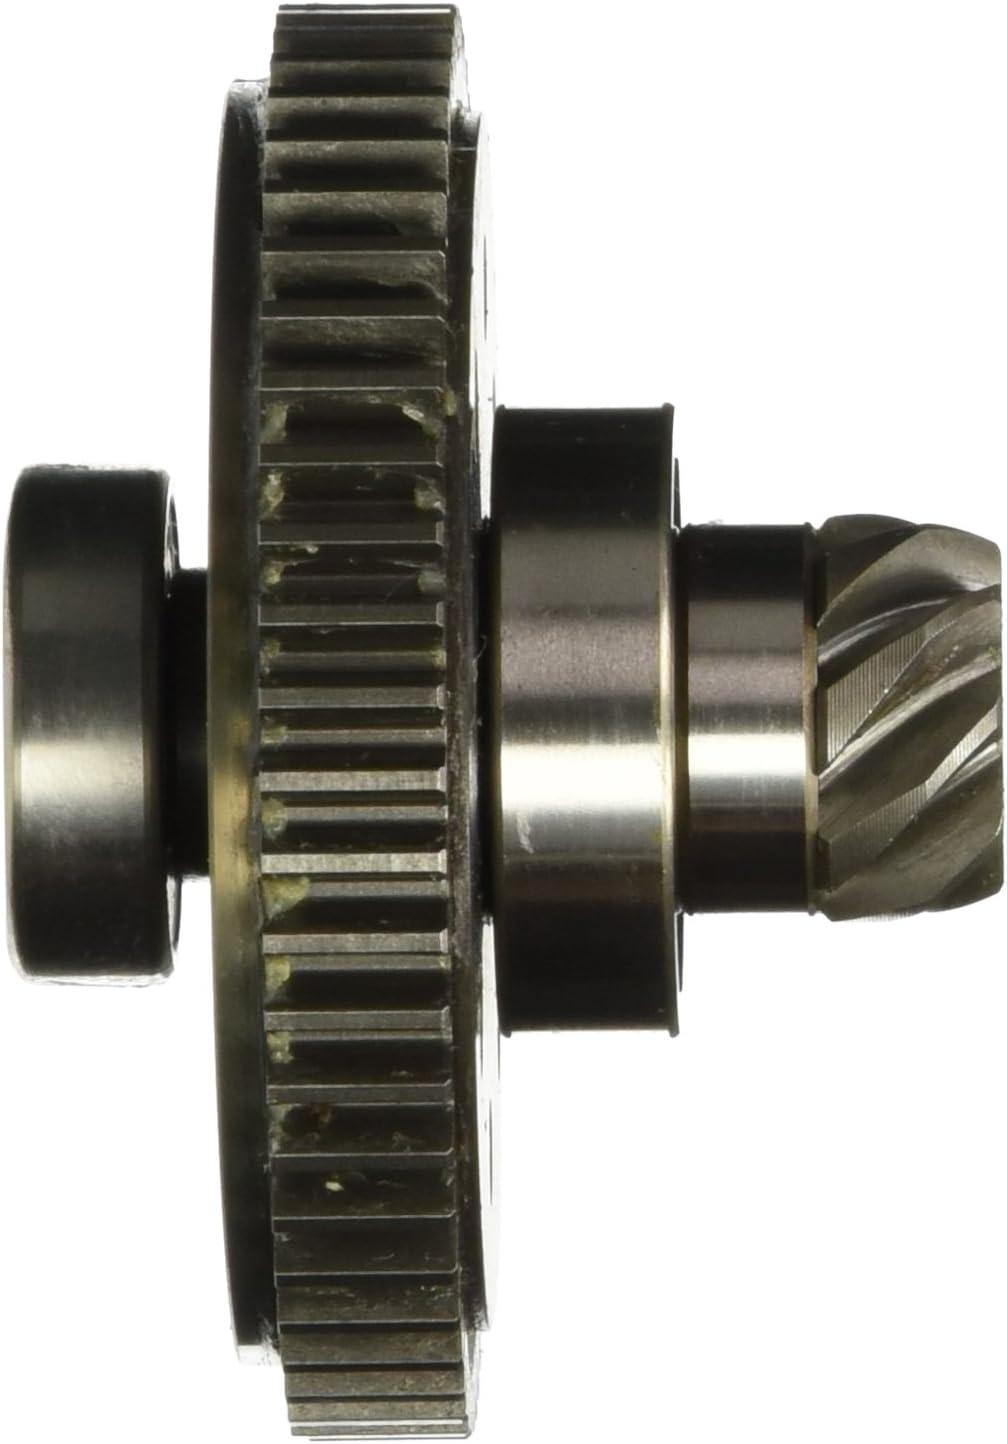 Hitachi 338178 SLIP CLUTCH ASSEMBLY DH45ME//MEY Replacement Part